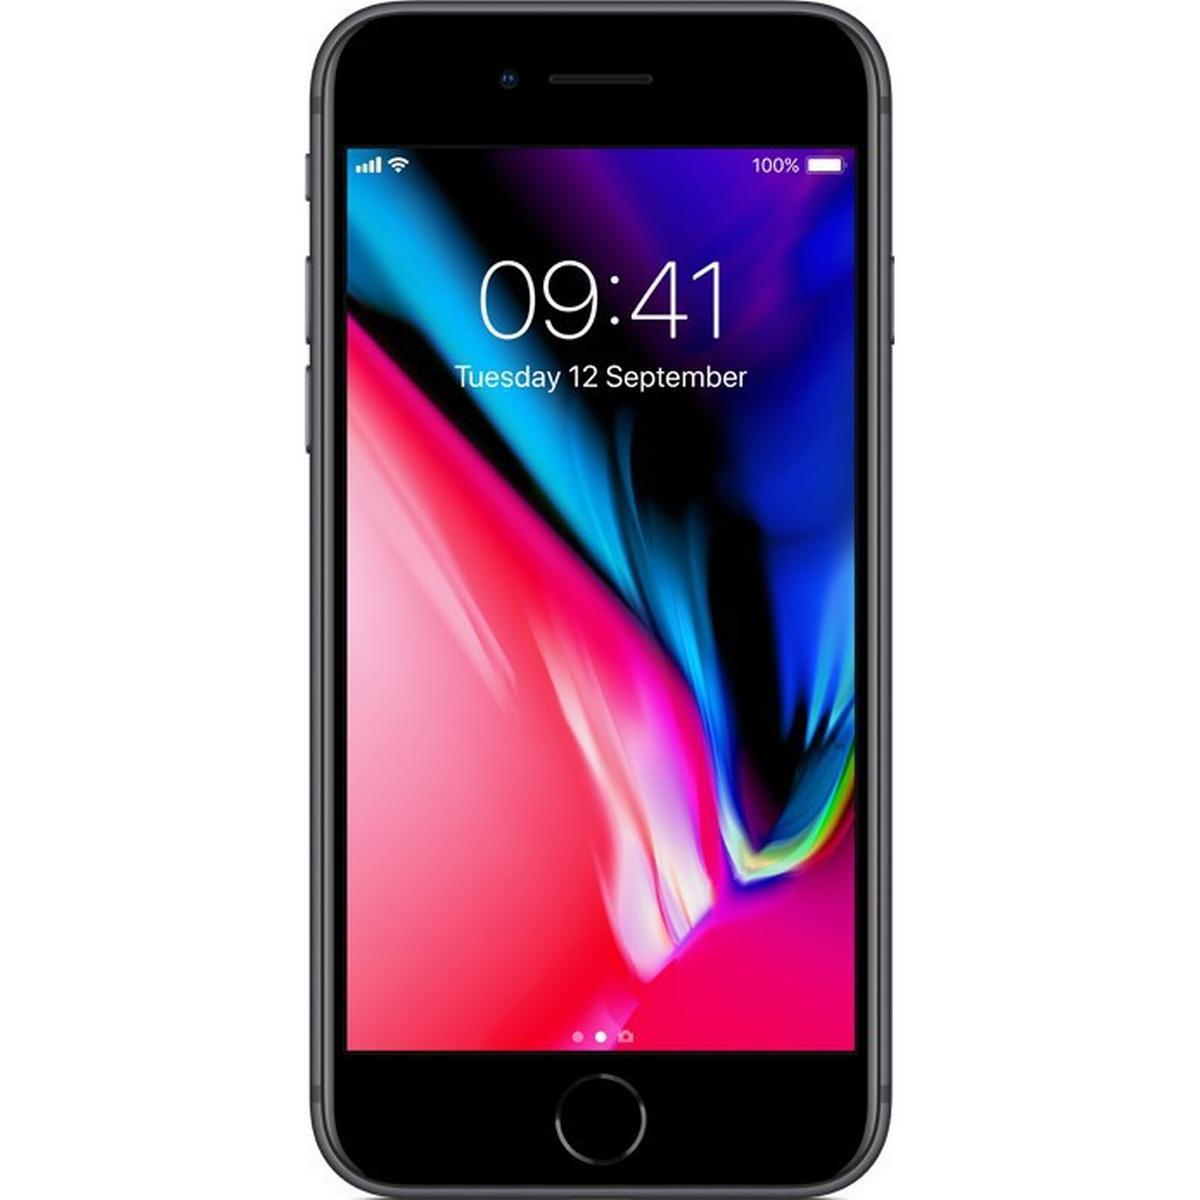 a1d298c14d2 Apple Mobiltelefoner - Jämför mobil priser på PriceRunner